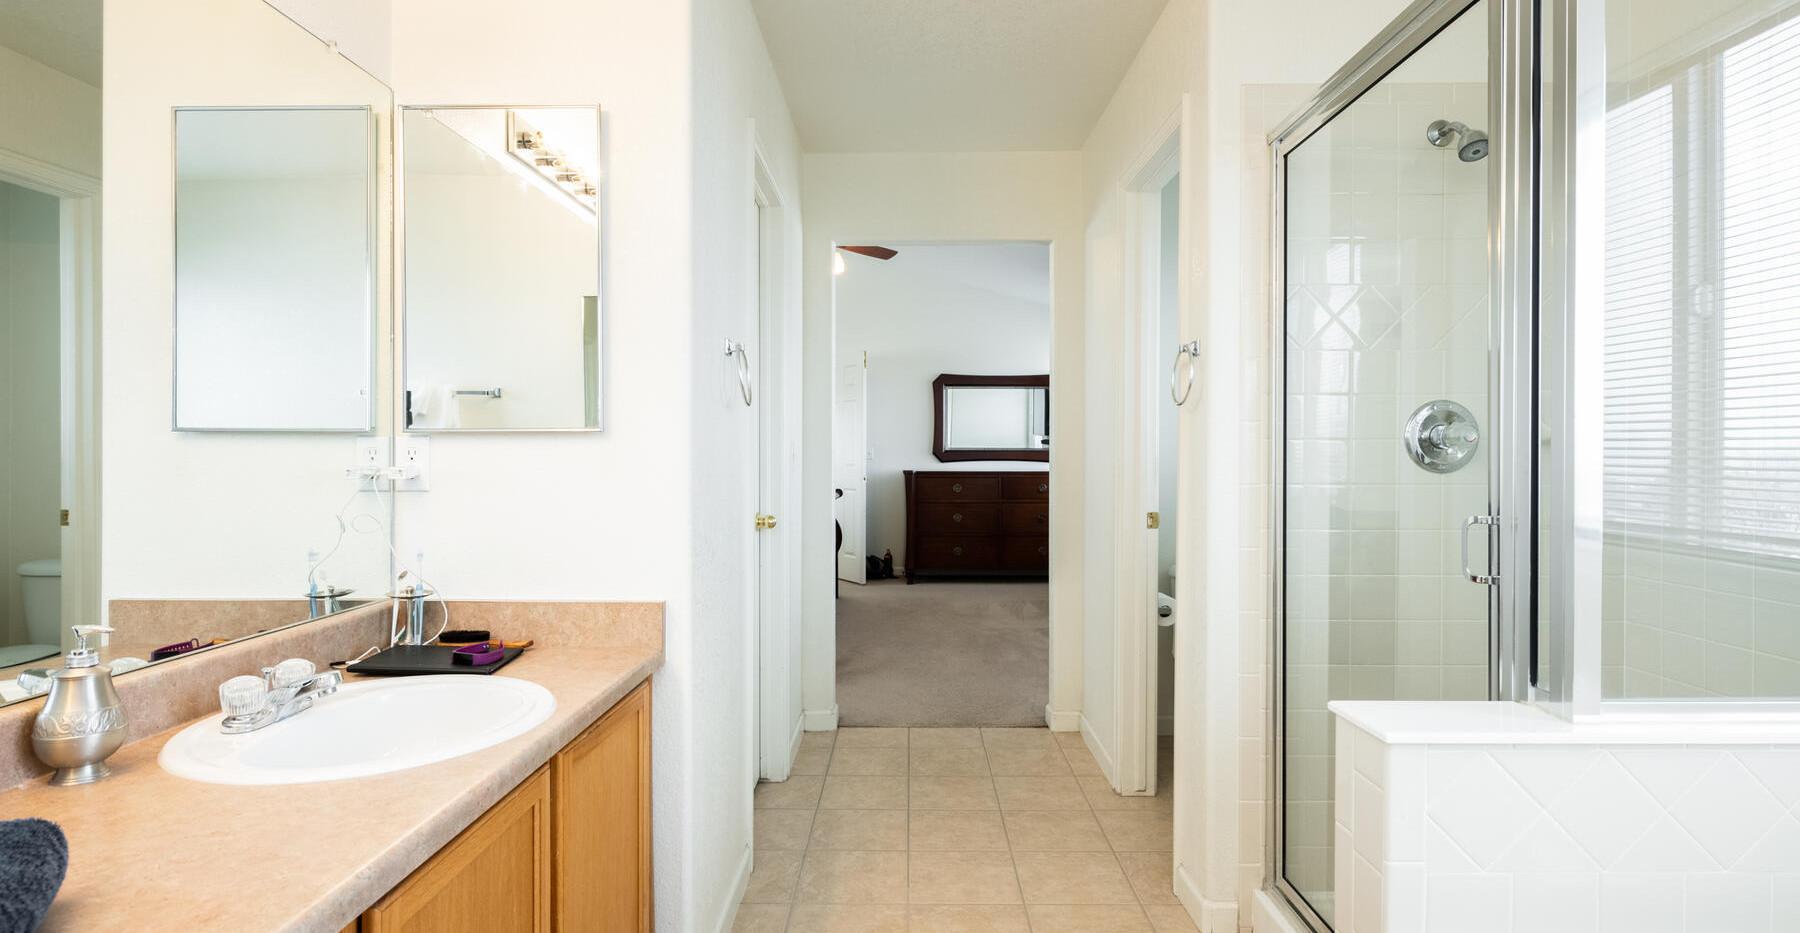 2112 W 101st Circle-033-040-Bathroom-MLS